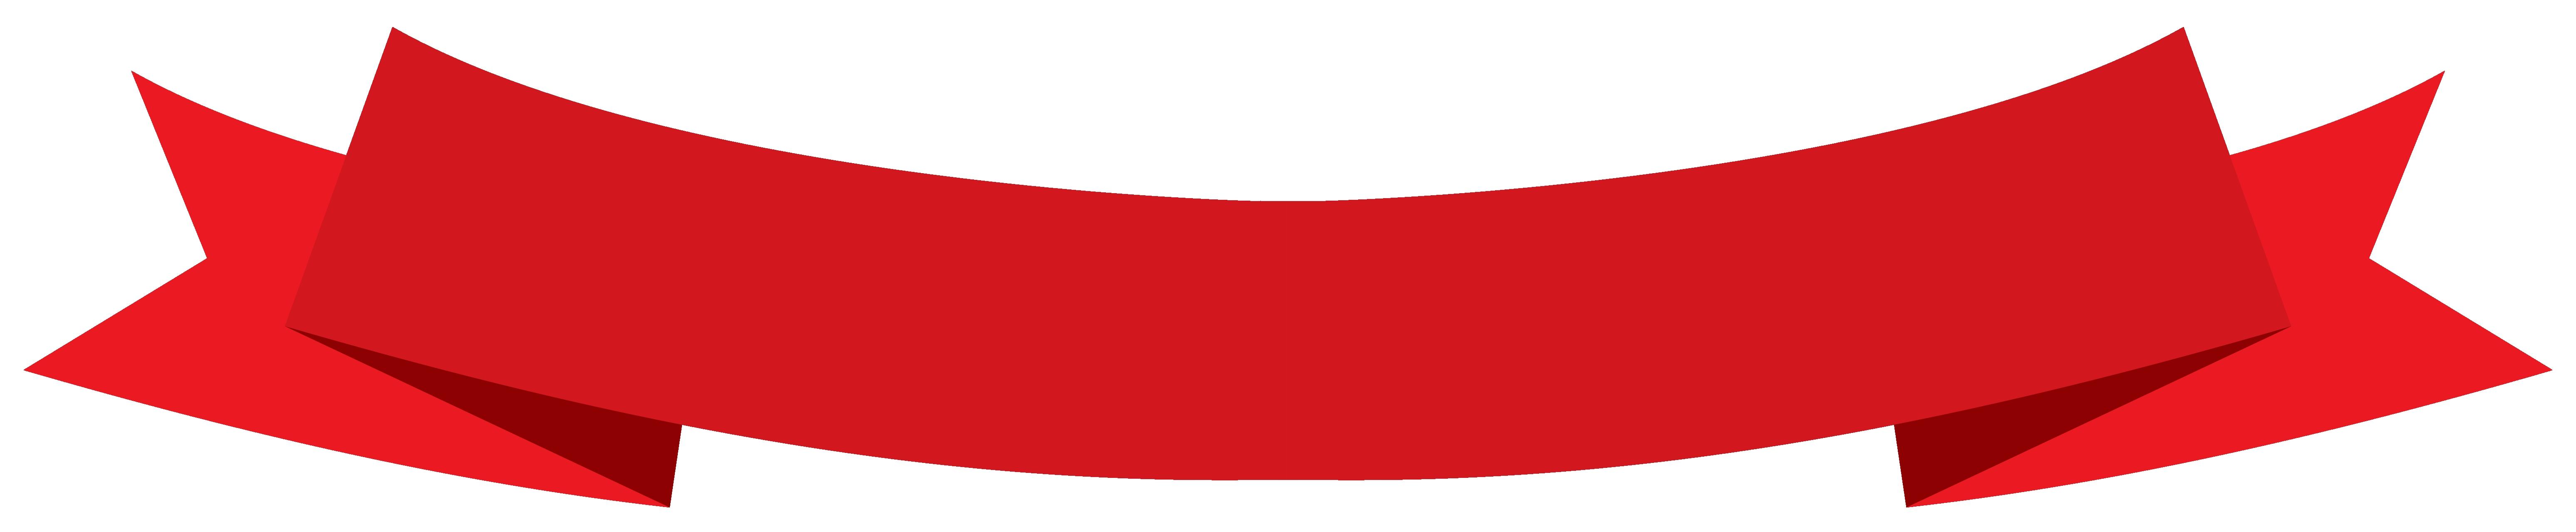 6191x1278 Vector Banner Shape Best Of Pink Vector Shapes Pink Label Clip Art